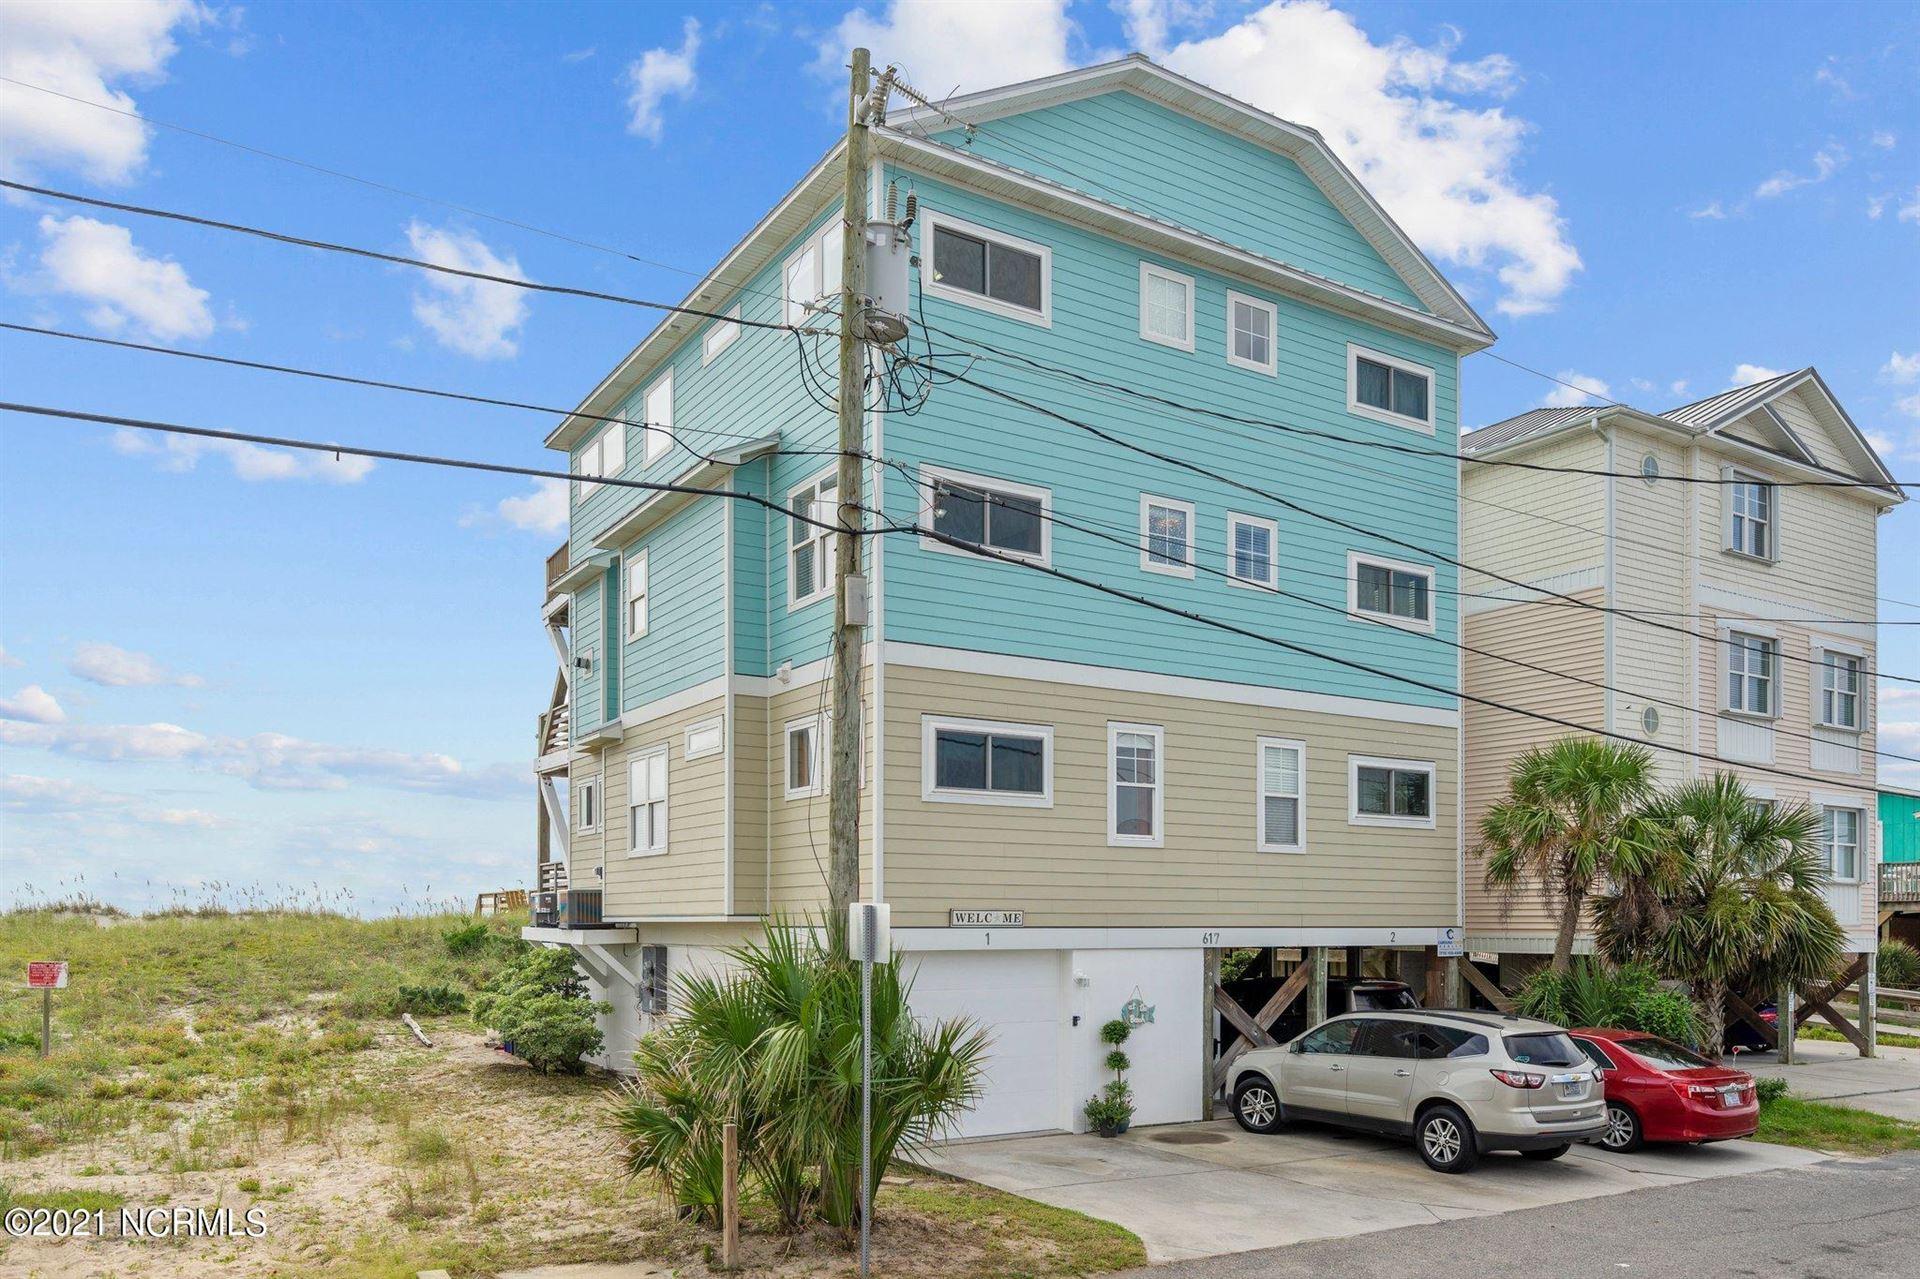 Photo for 617 S Carolina Beach Avenue #Unit 1, Carolina Beach, NC 28428 (MLS # 100287301)